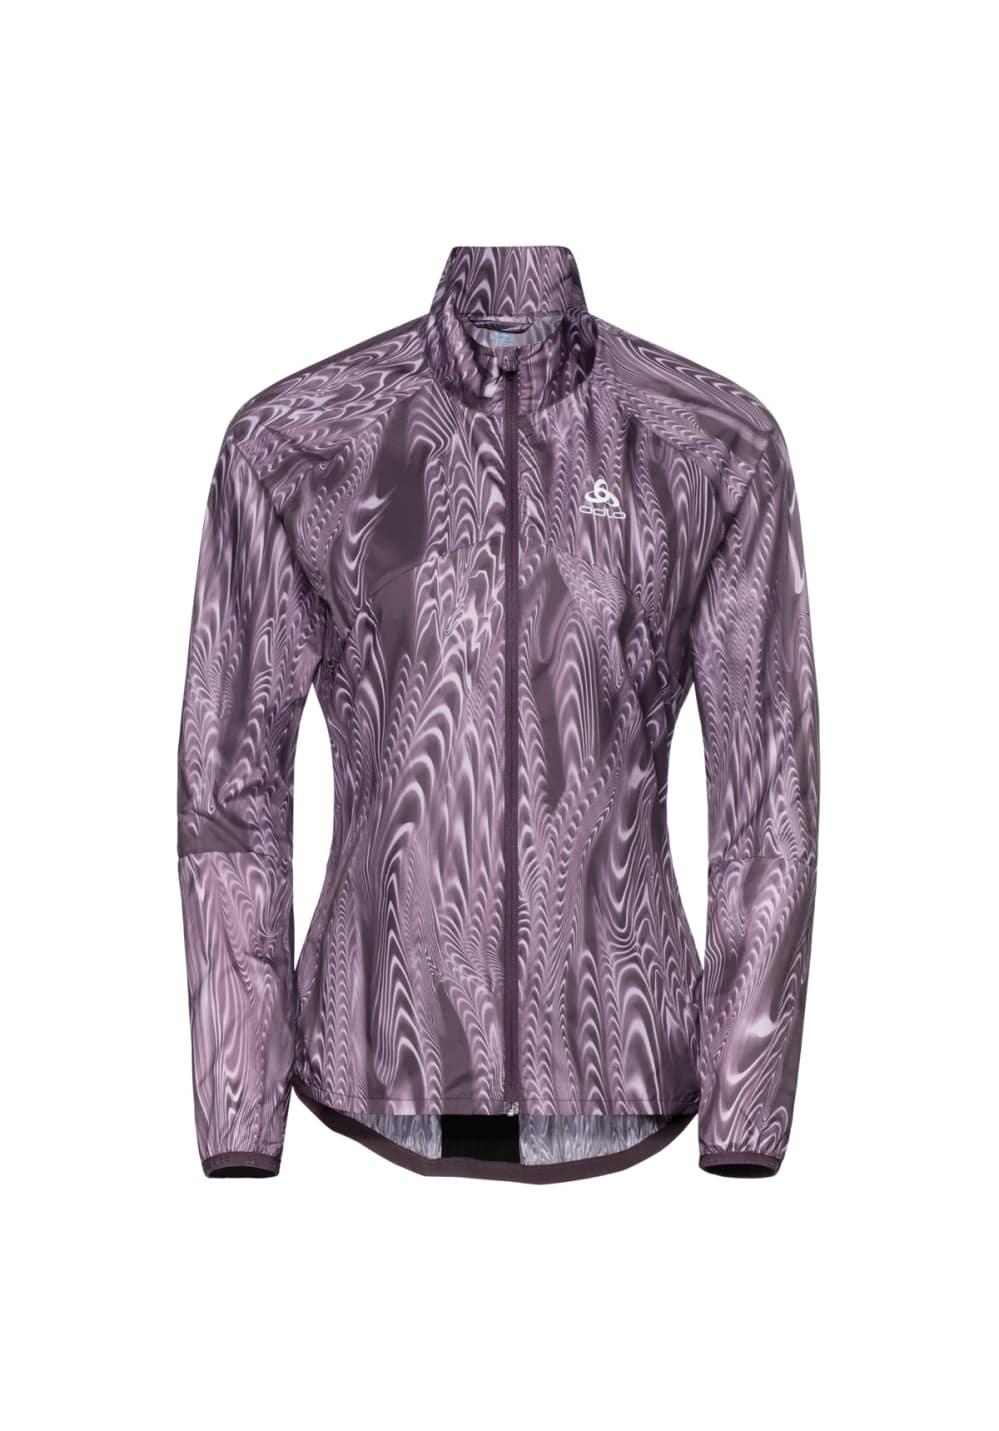 Odlo Jacket Omnius Light - Laufjacken für Damen - Lila